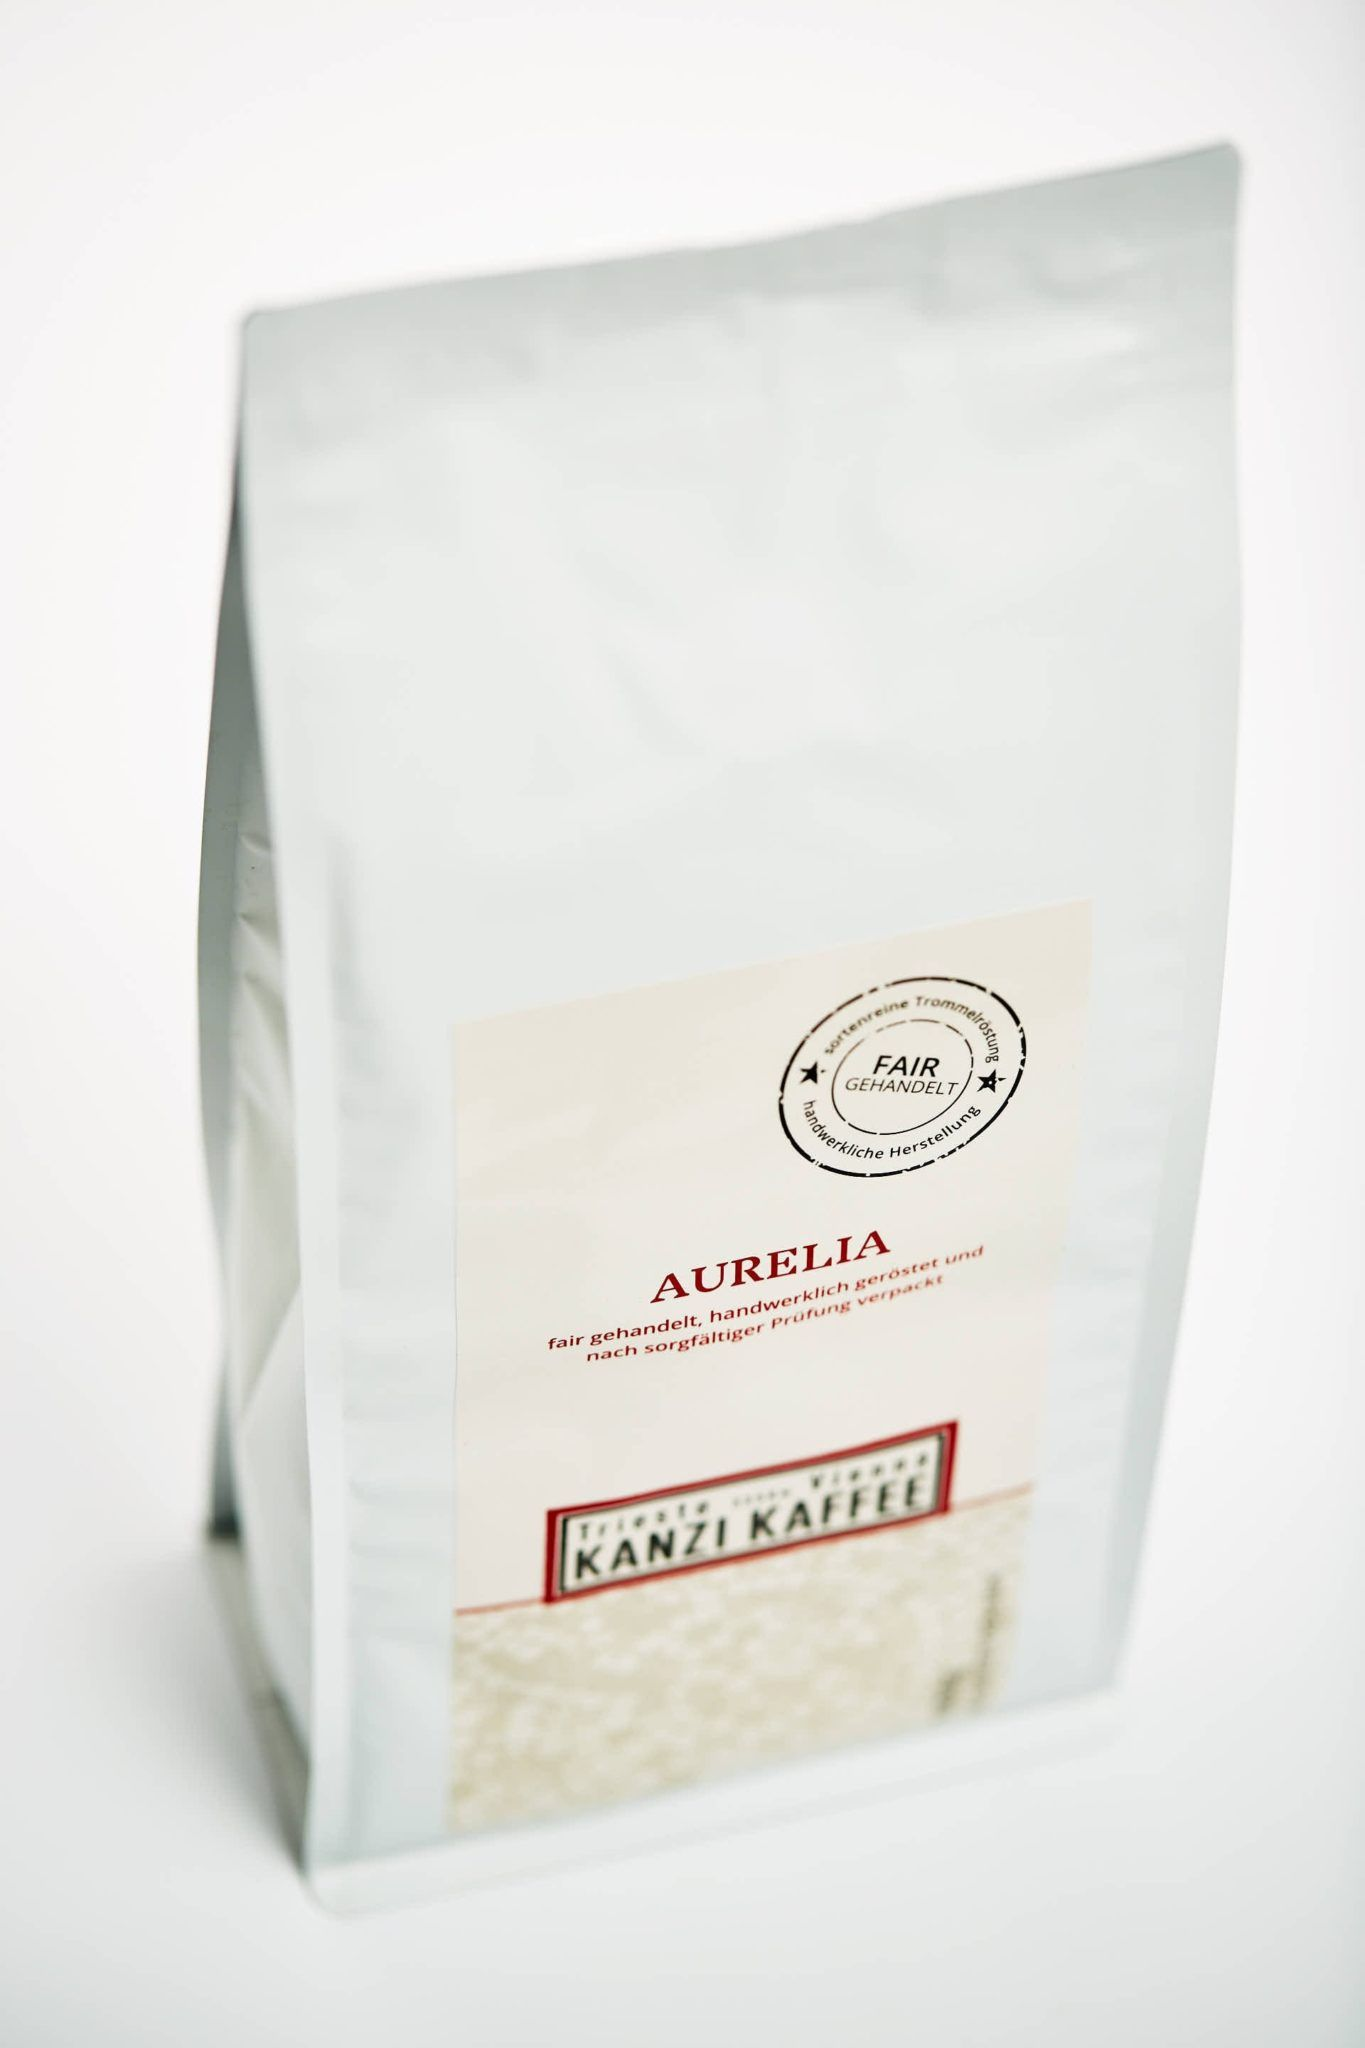 Kanzi Kaffee Beutel ein Kilo mit Aurelia Kaffee